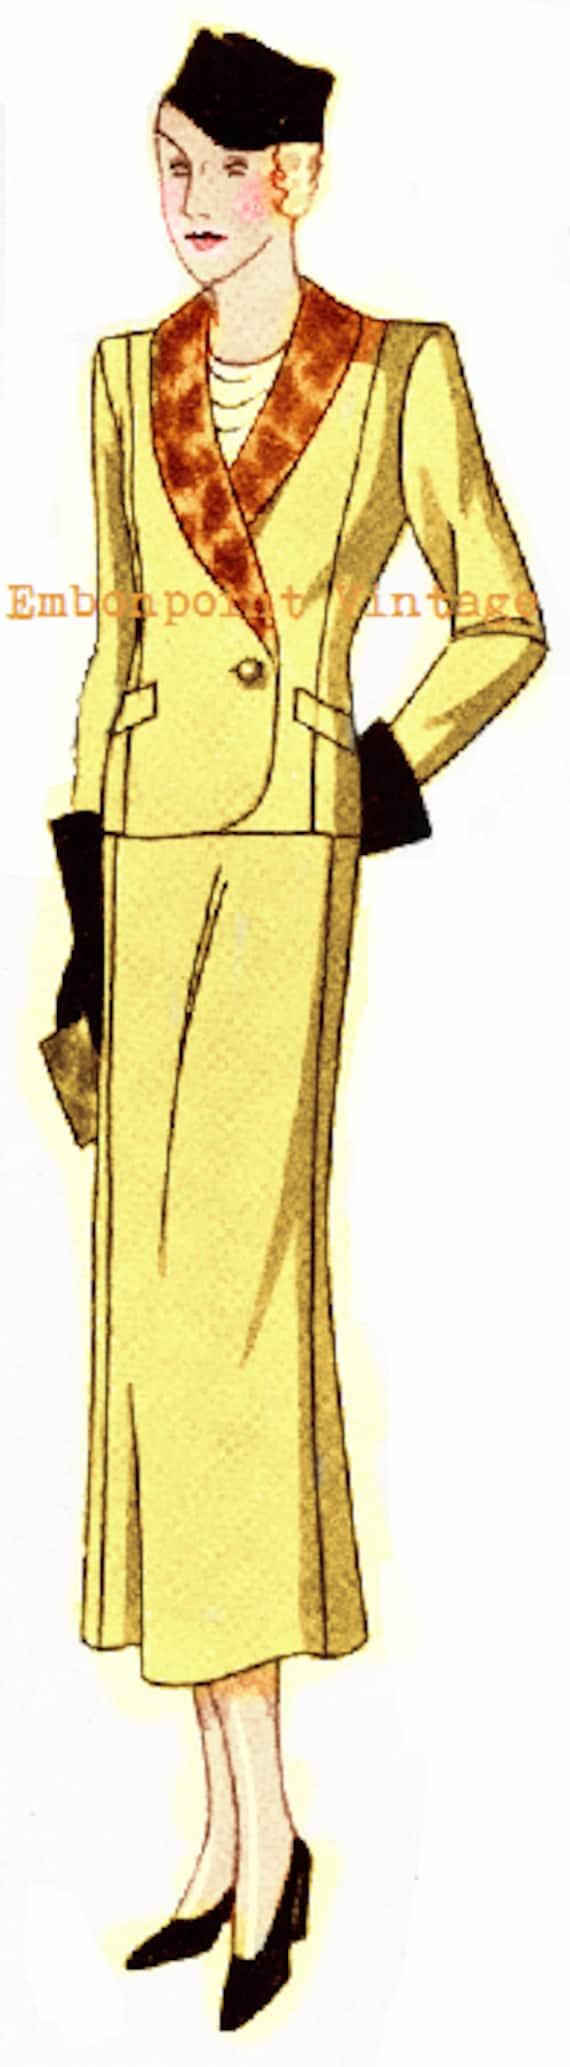 1930s Vintage Dresses, Clothing & Patterns Links Plus Size (or any size) 1934 Vintage Suit Ensemble Sewing Pattern - PDF - Pattern No 76 Earnestine 1930s 30s Patterns Instant Download  AT vintagedancer.com